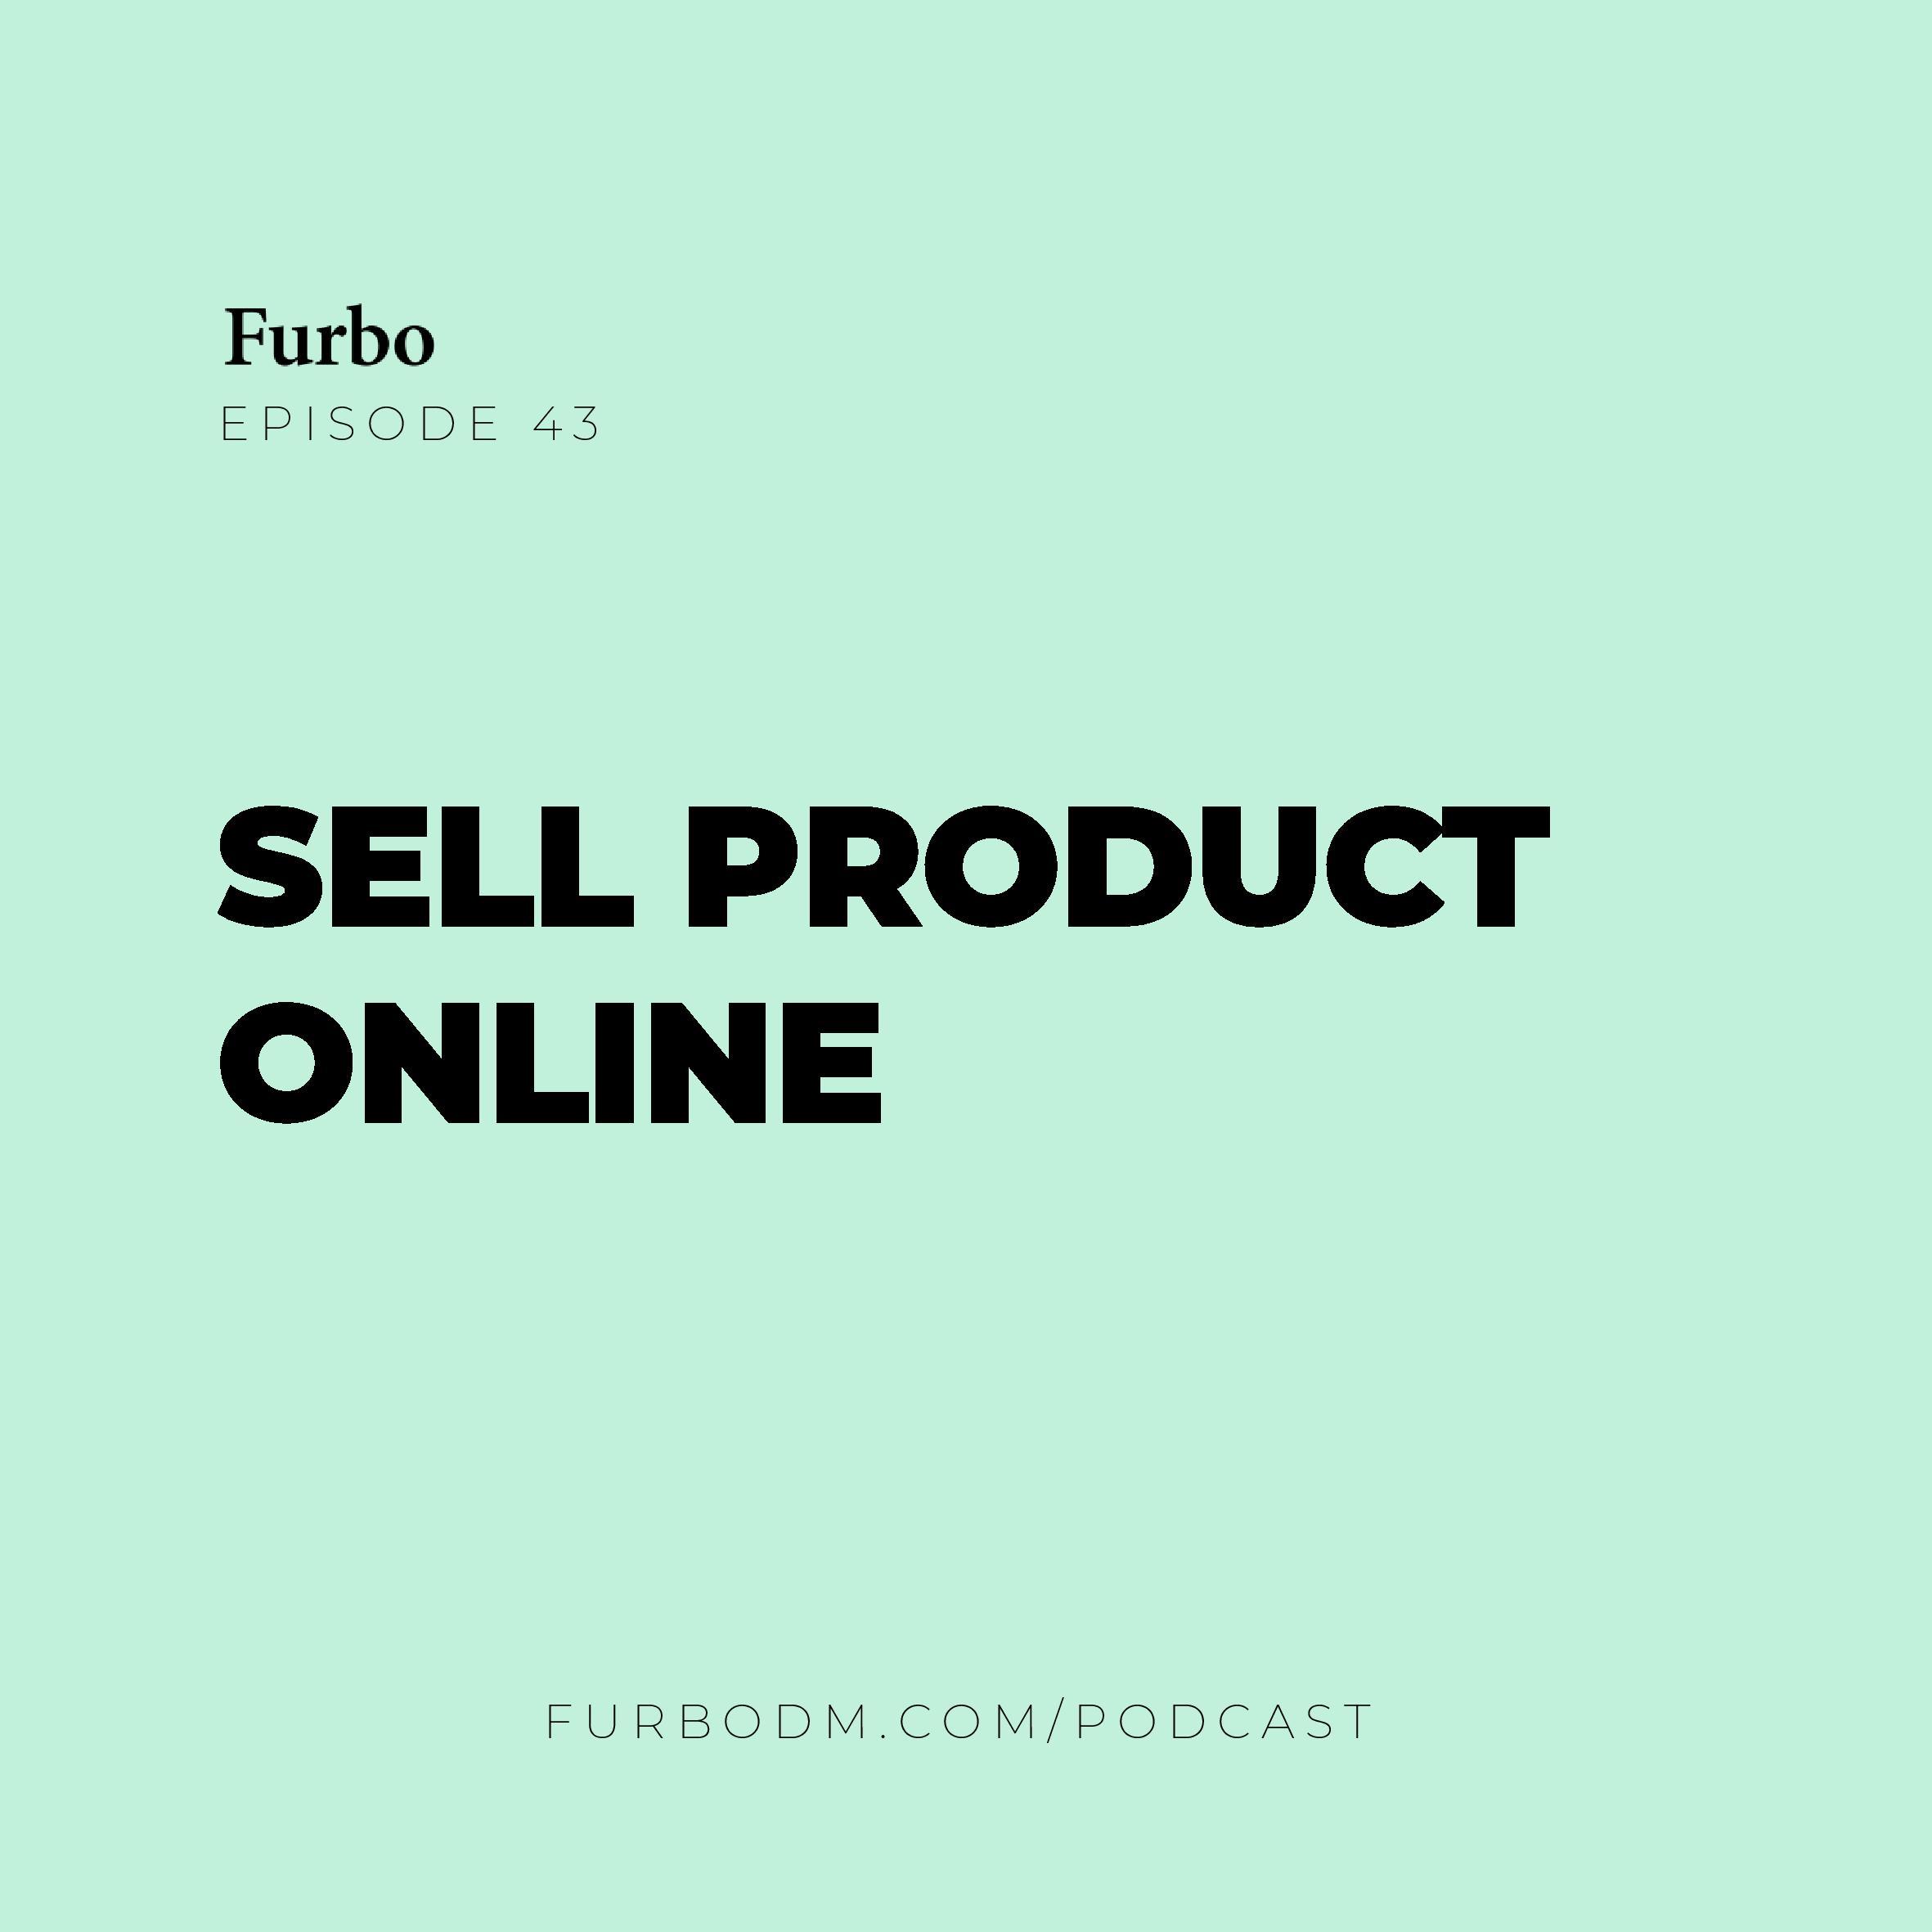 E43: Sell Product Online   راههای فروش آنلاین محصول کدامند؟